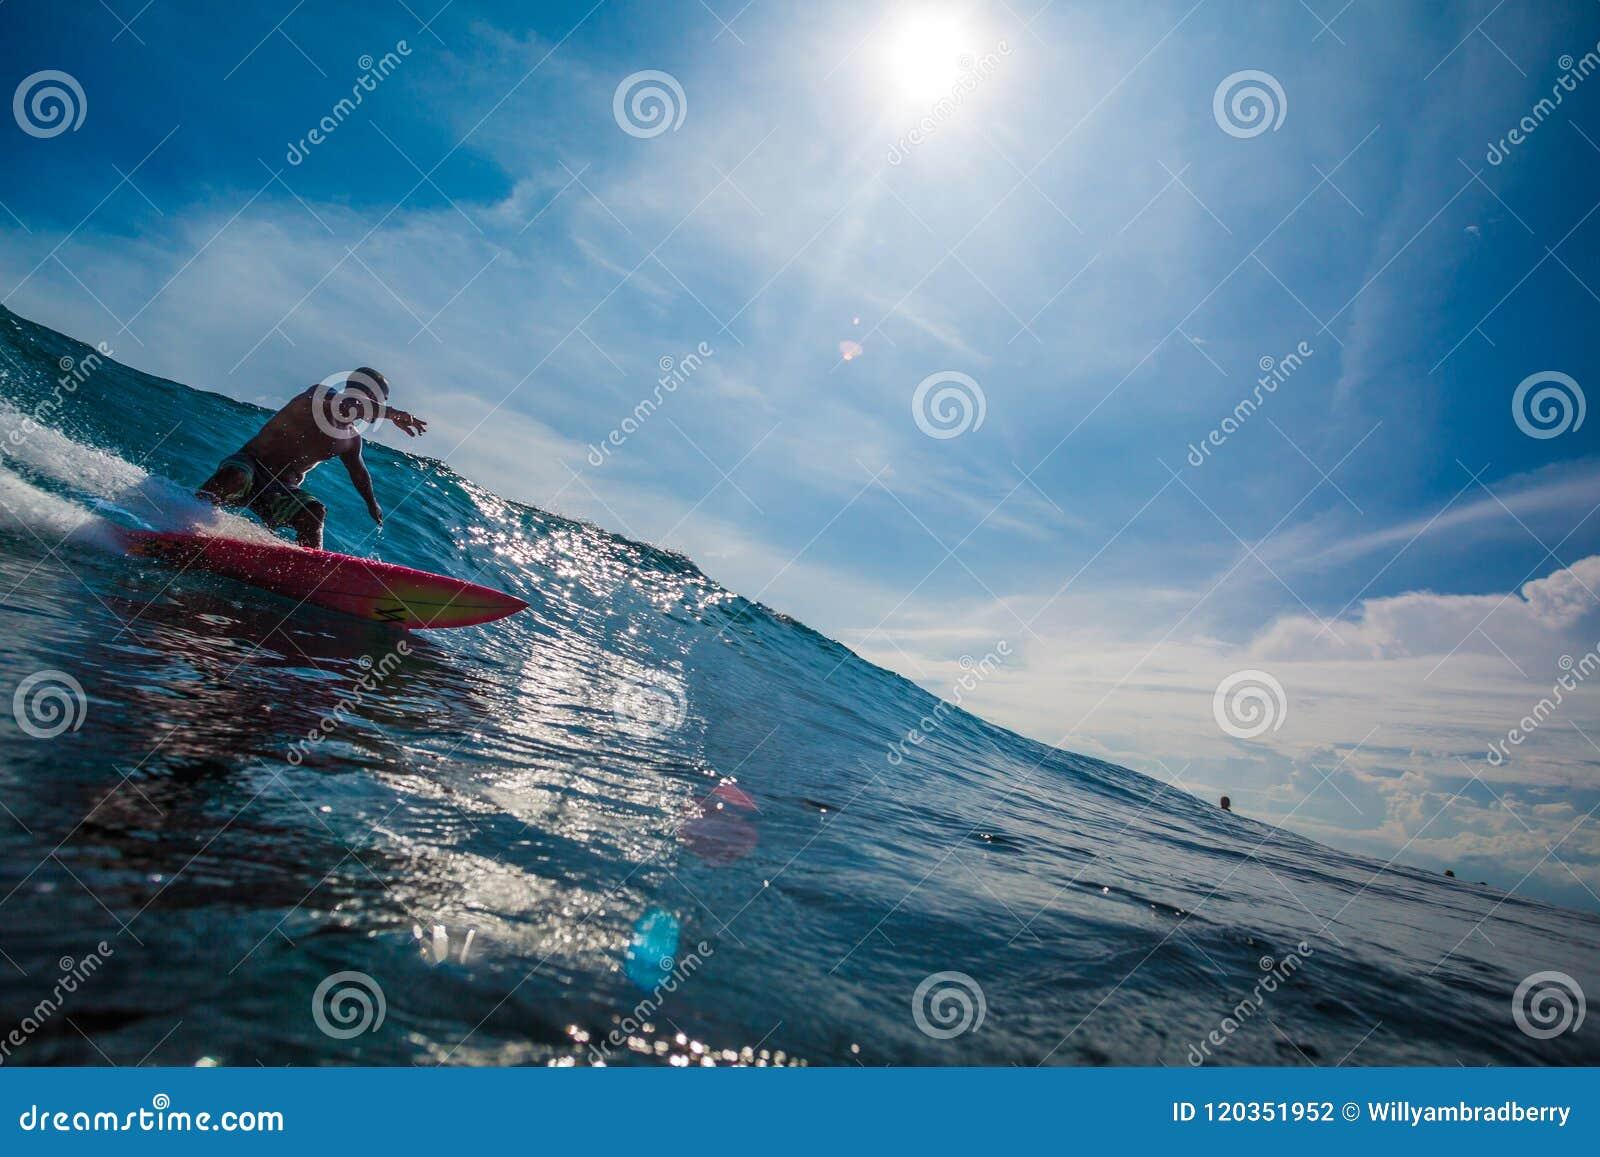 Indonesia, Bali, July 13 2016: A male surfer riding big blue oce